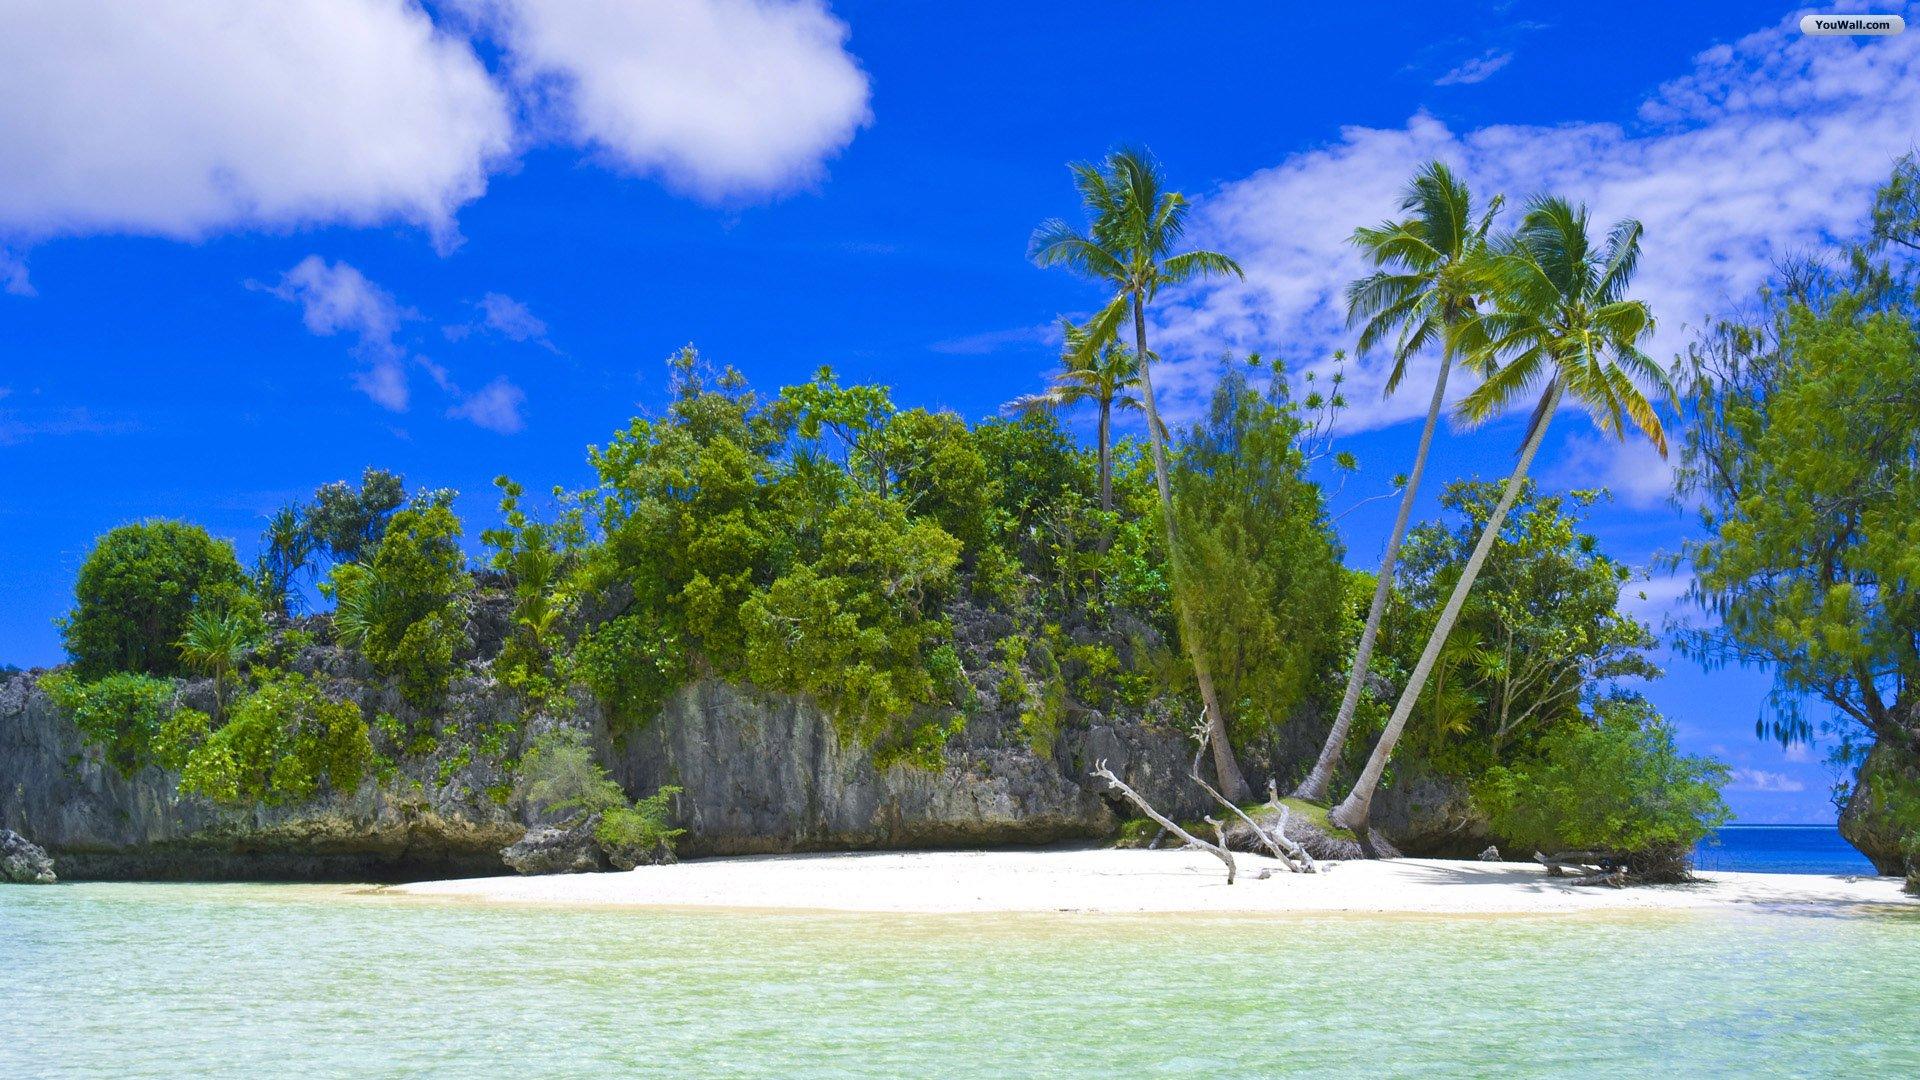 - Tropical Island Wallpaper - wallpaper,wallpapers,free wallpaper ...